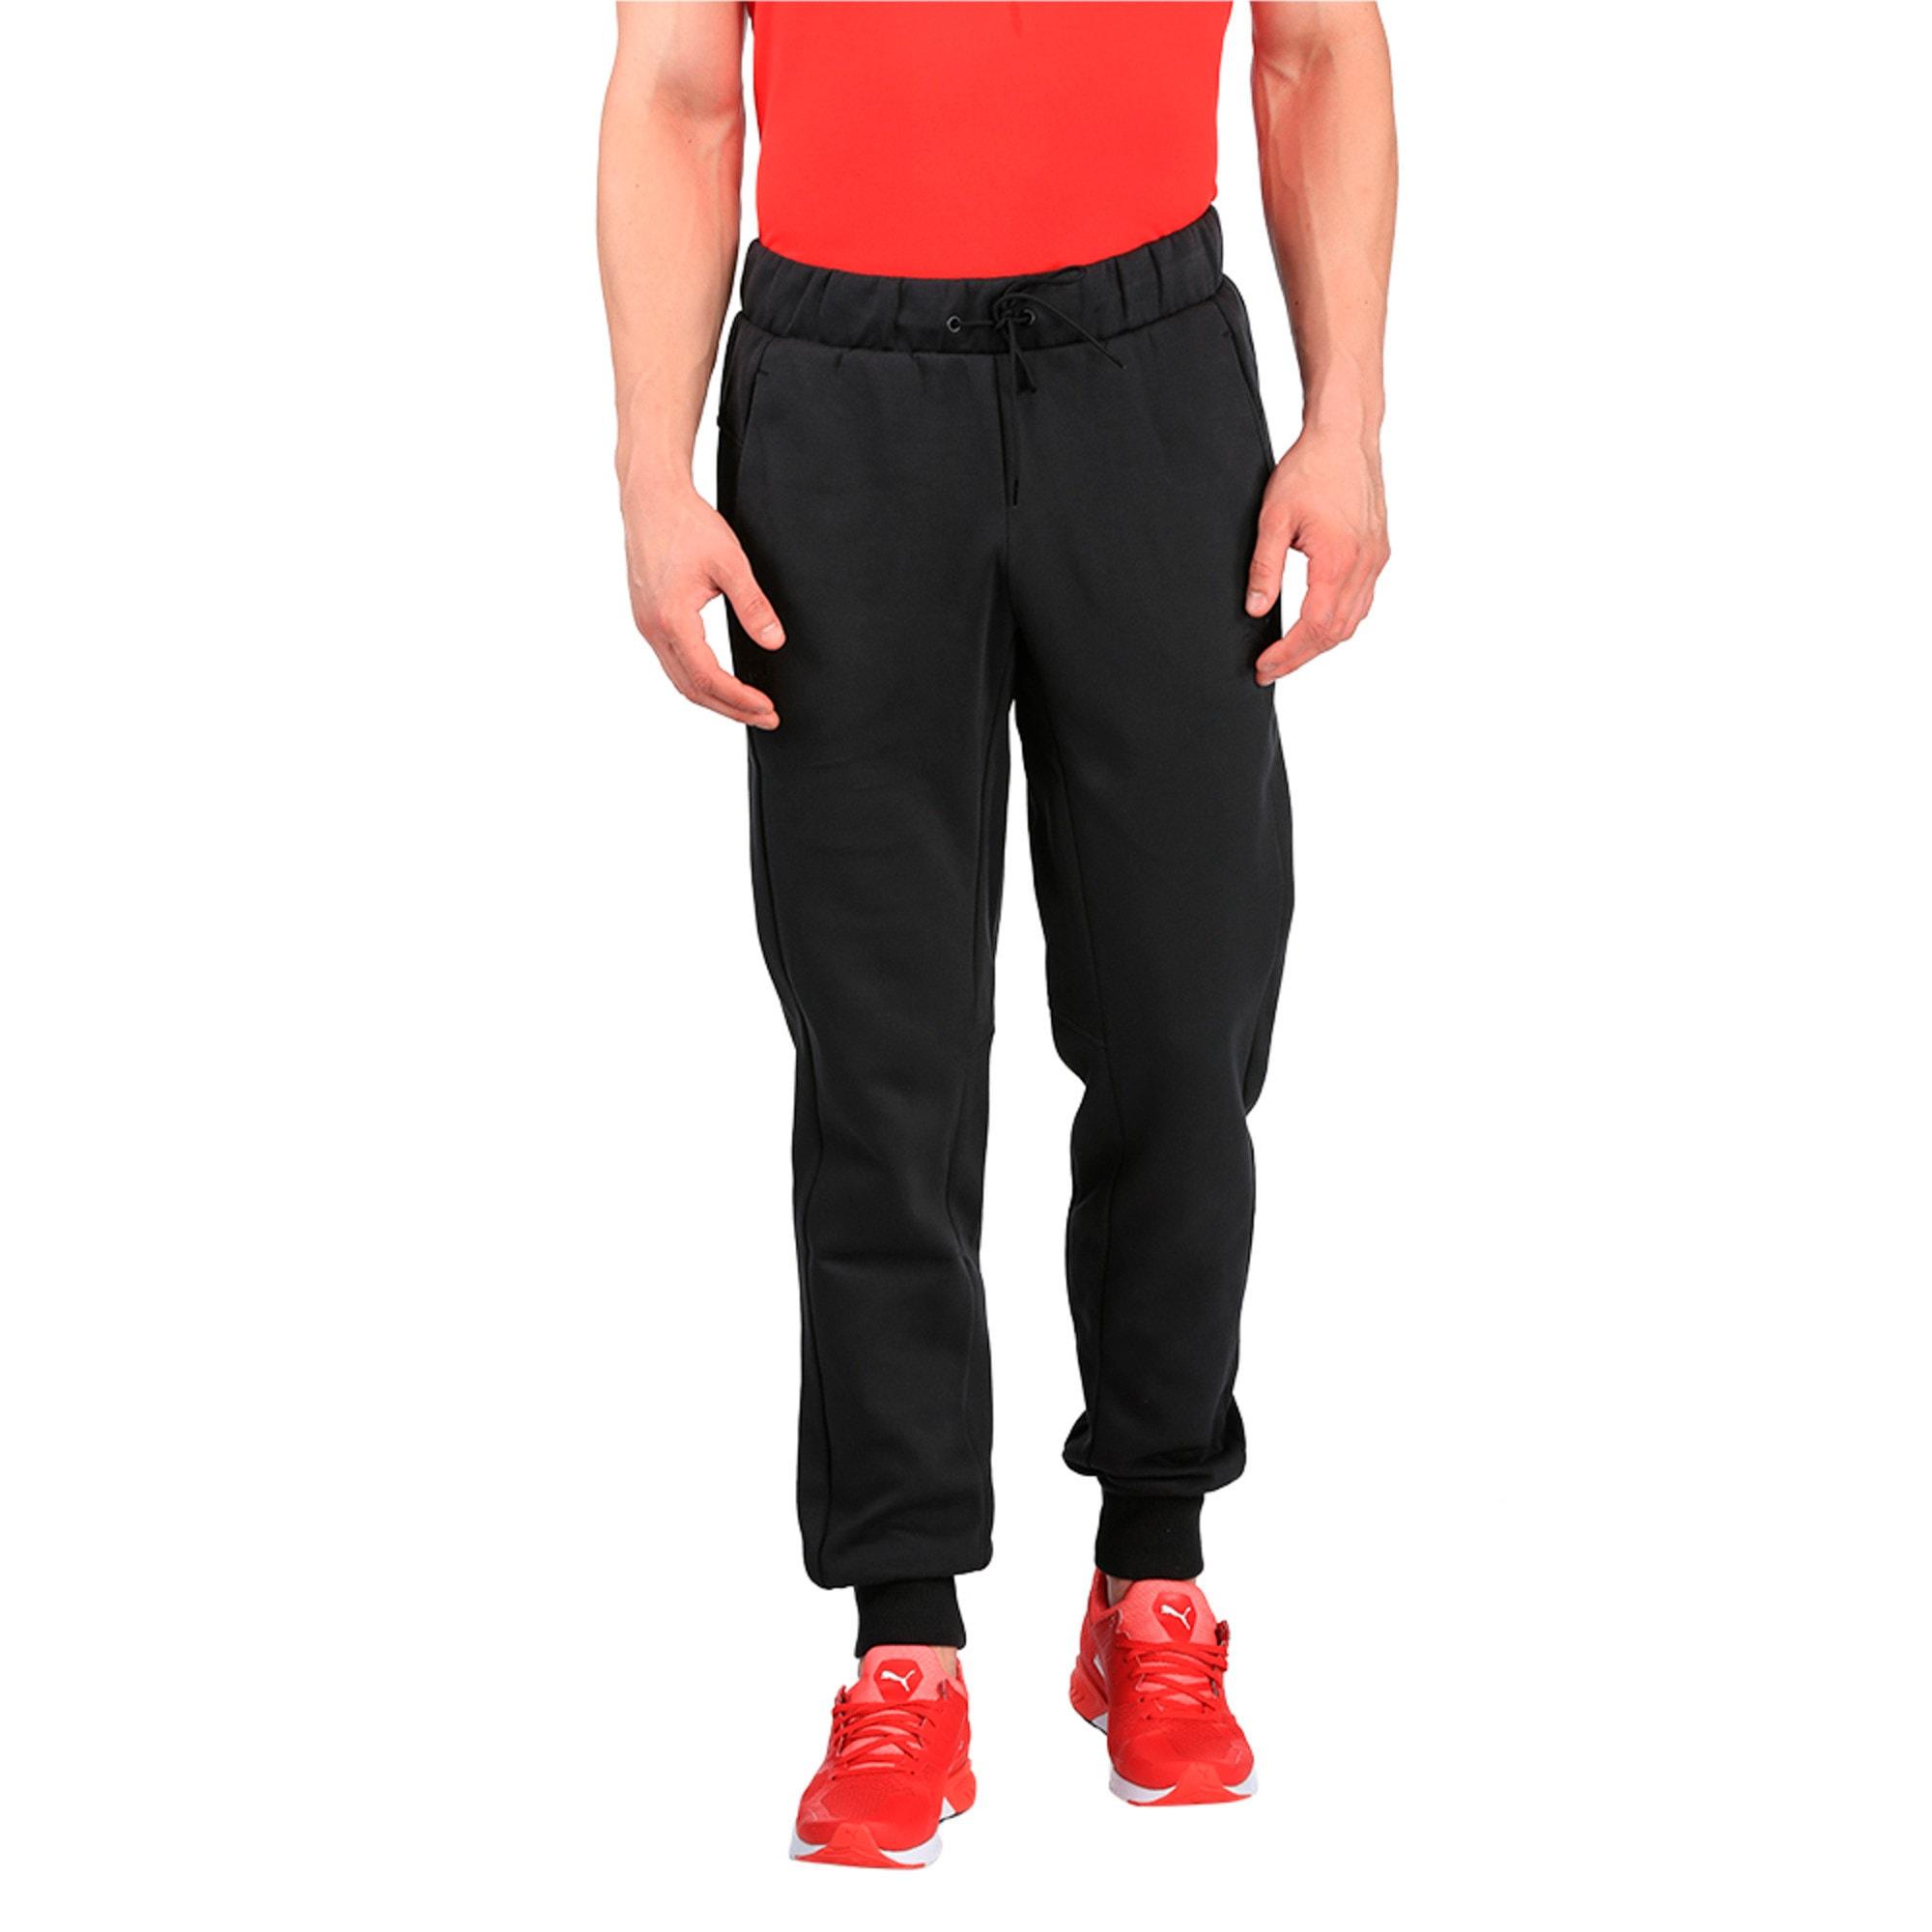 Thumbnail 1 of Ferrari Men's Sweatpants, Moonless Night, medium-IND